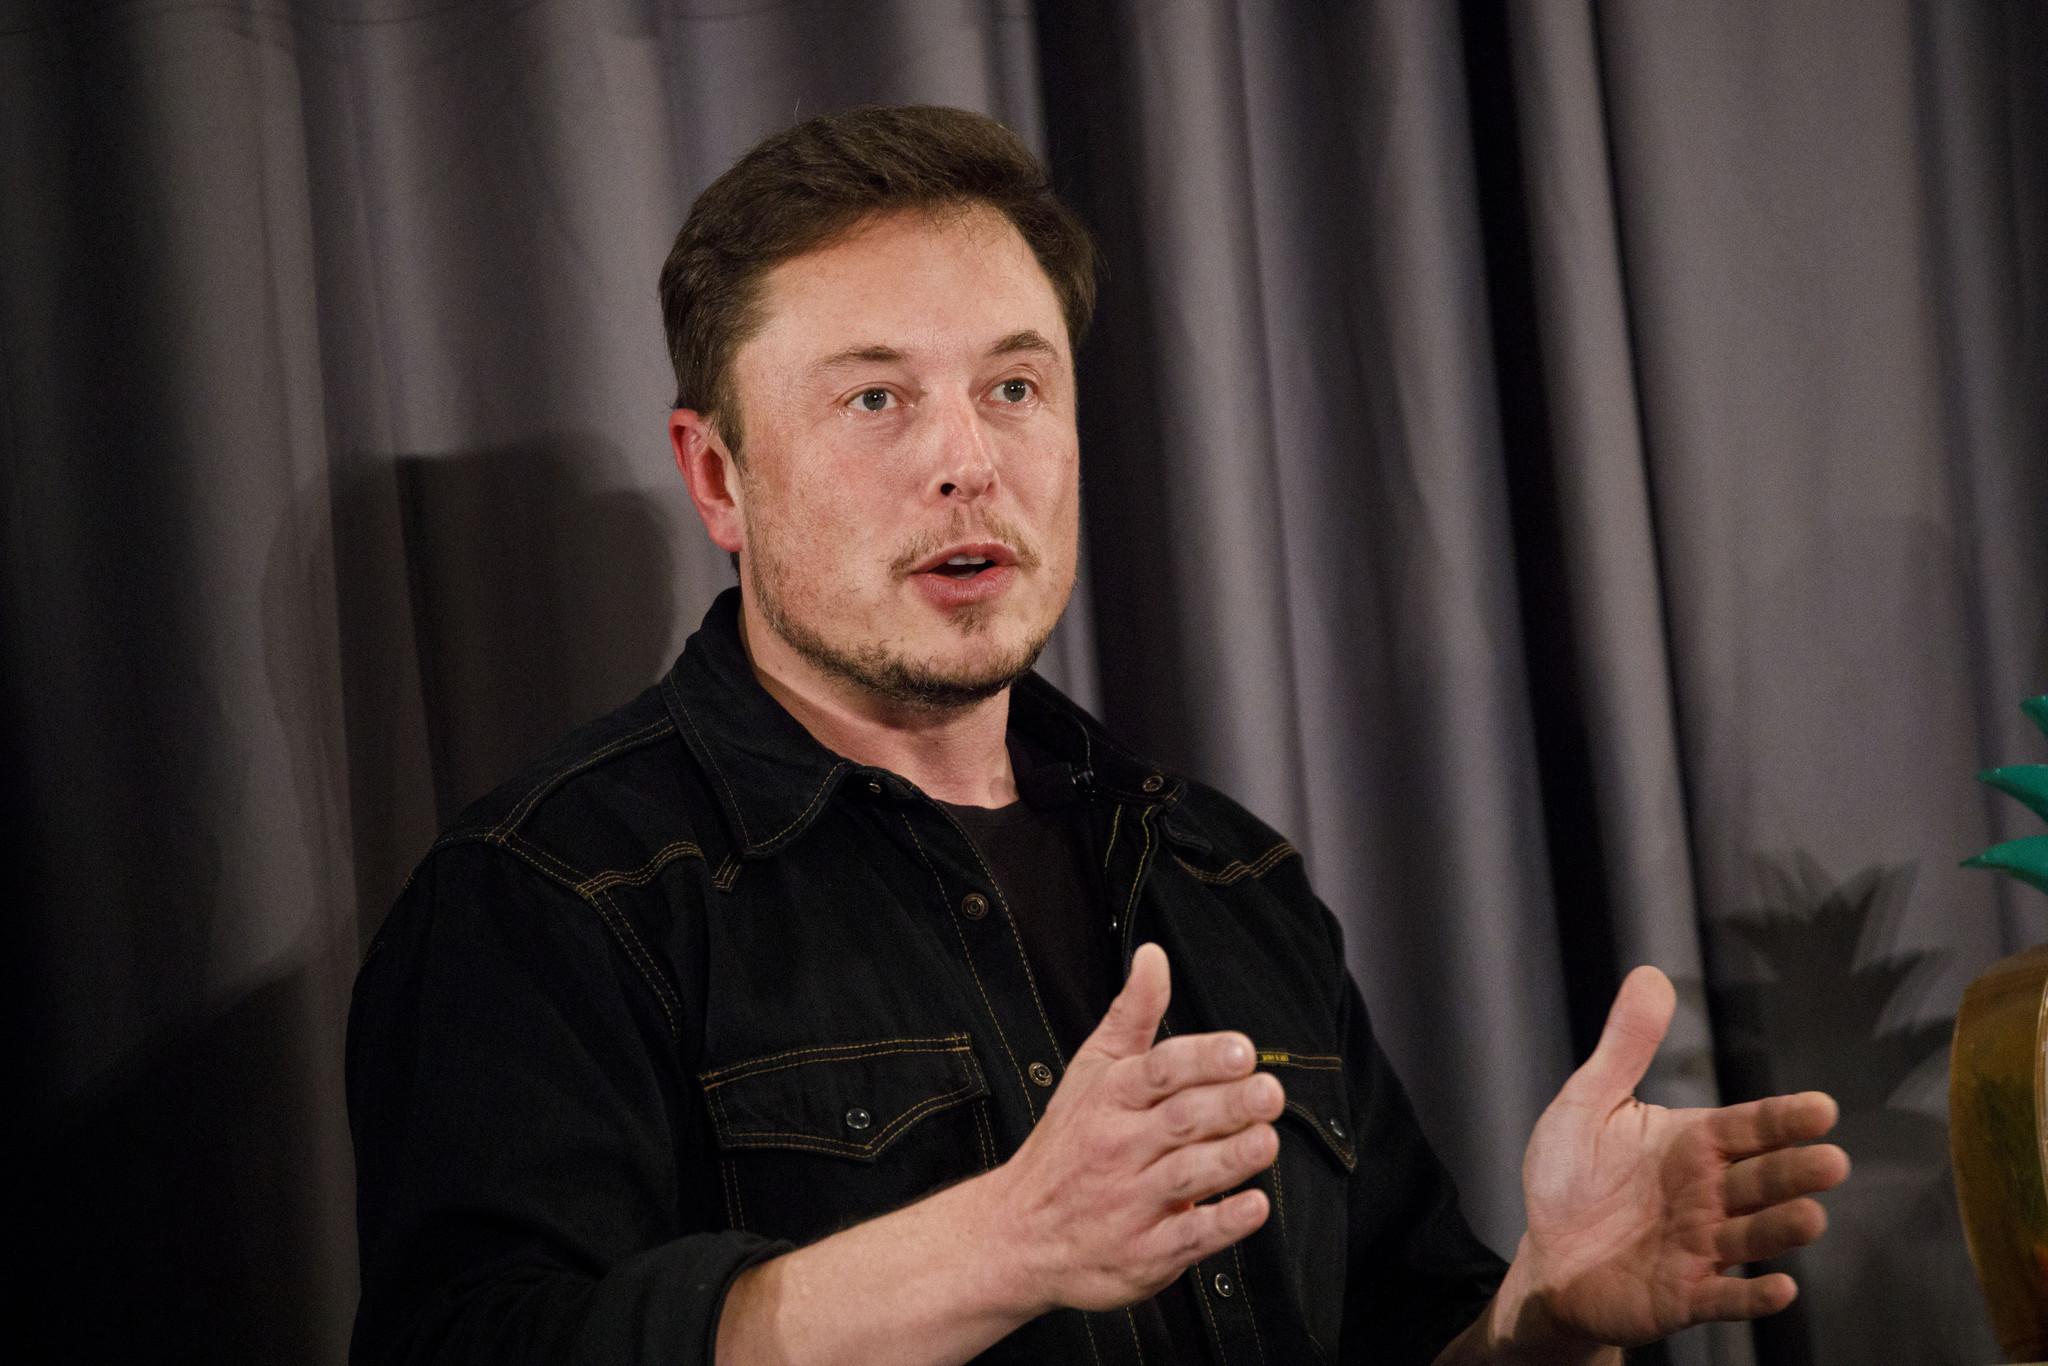 Tesla Stock Falls After Elon Musk Appears To Smoke